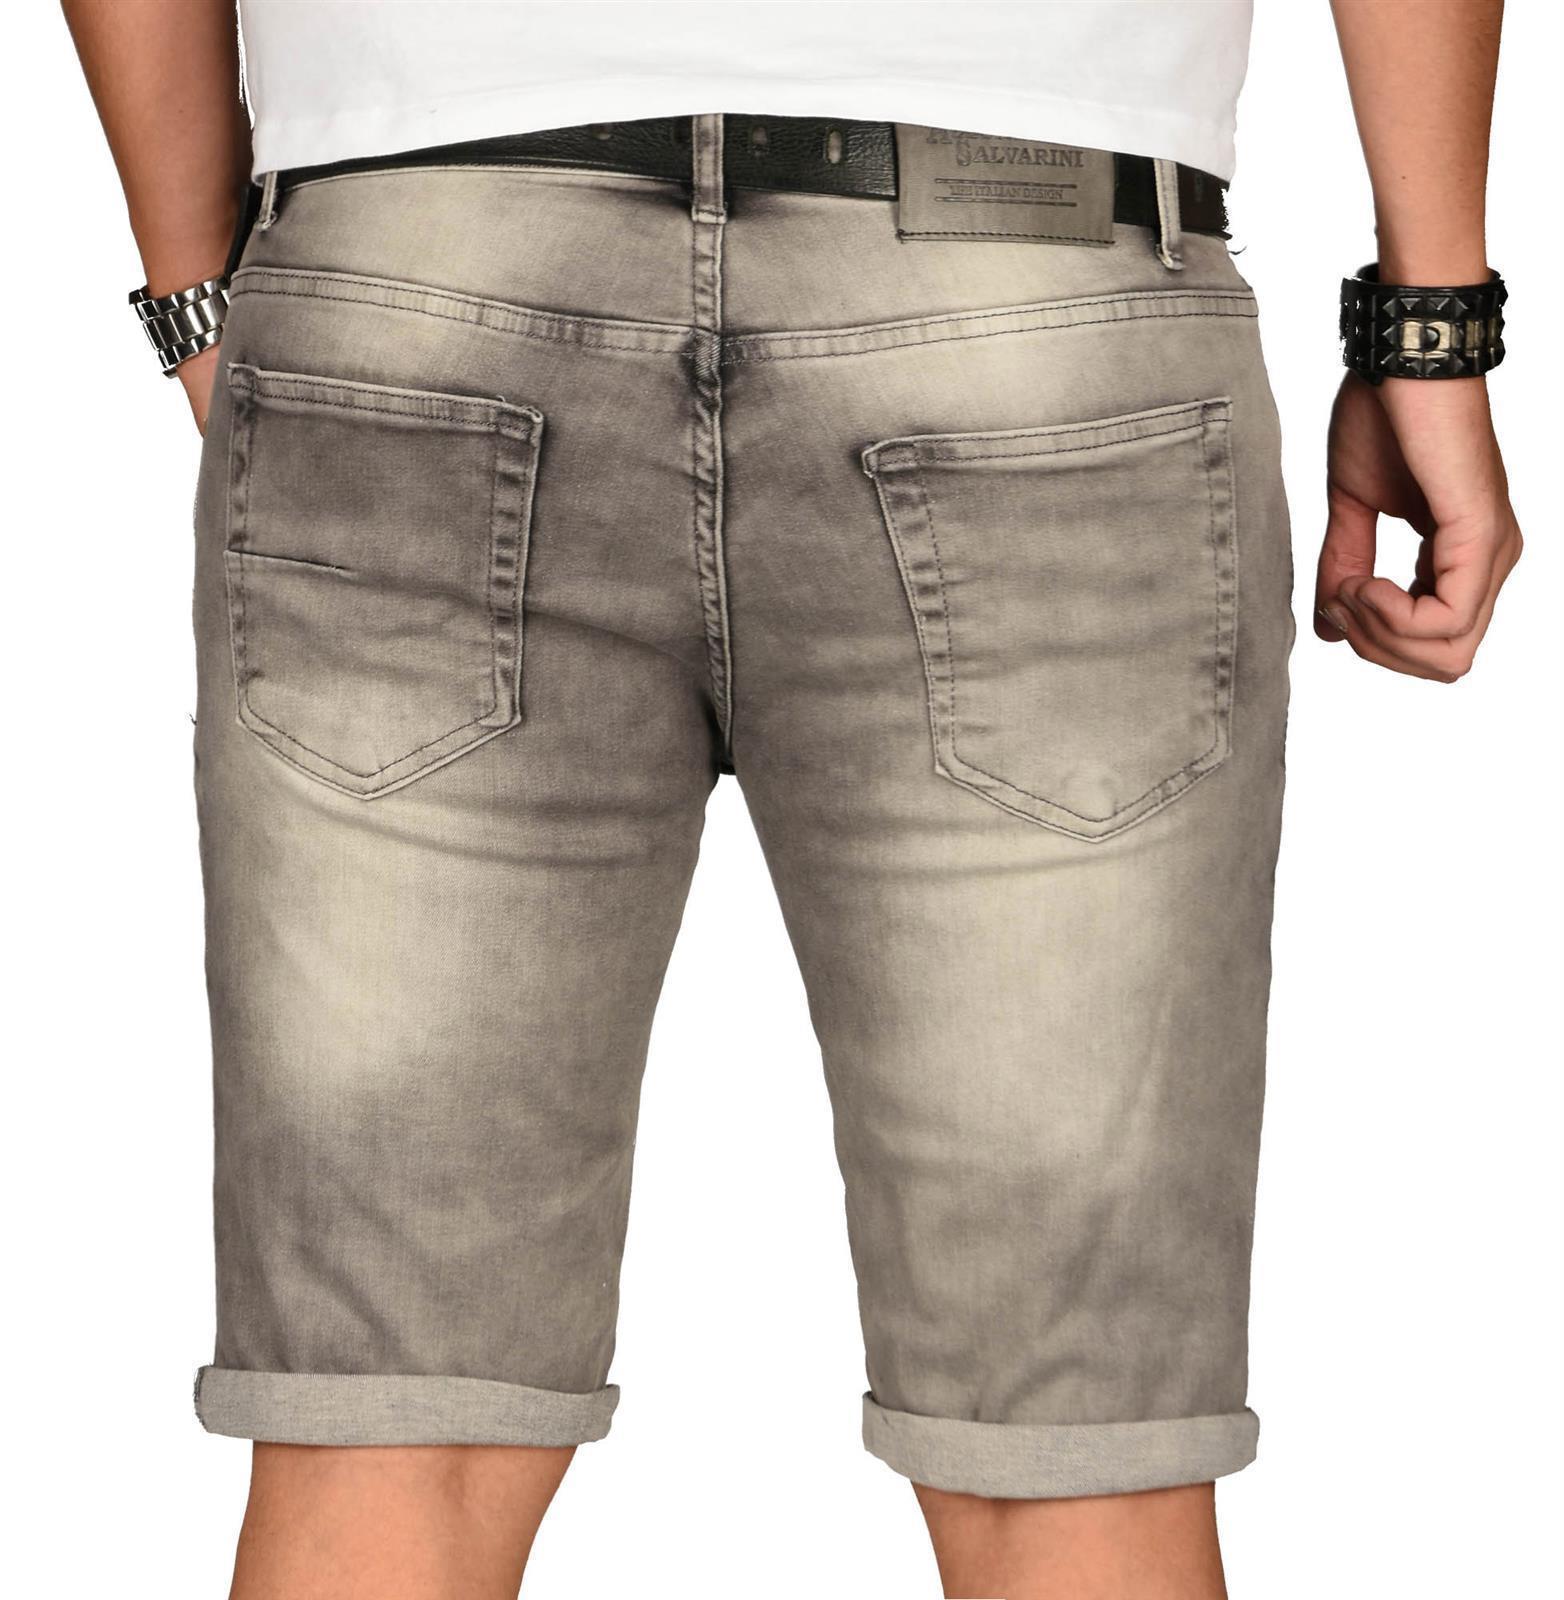 A-Salvarini-Herren-Designer-Jeans-Short-kurze-Hose-Slim-Sommer-Shorts-Washed Indexbild 45